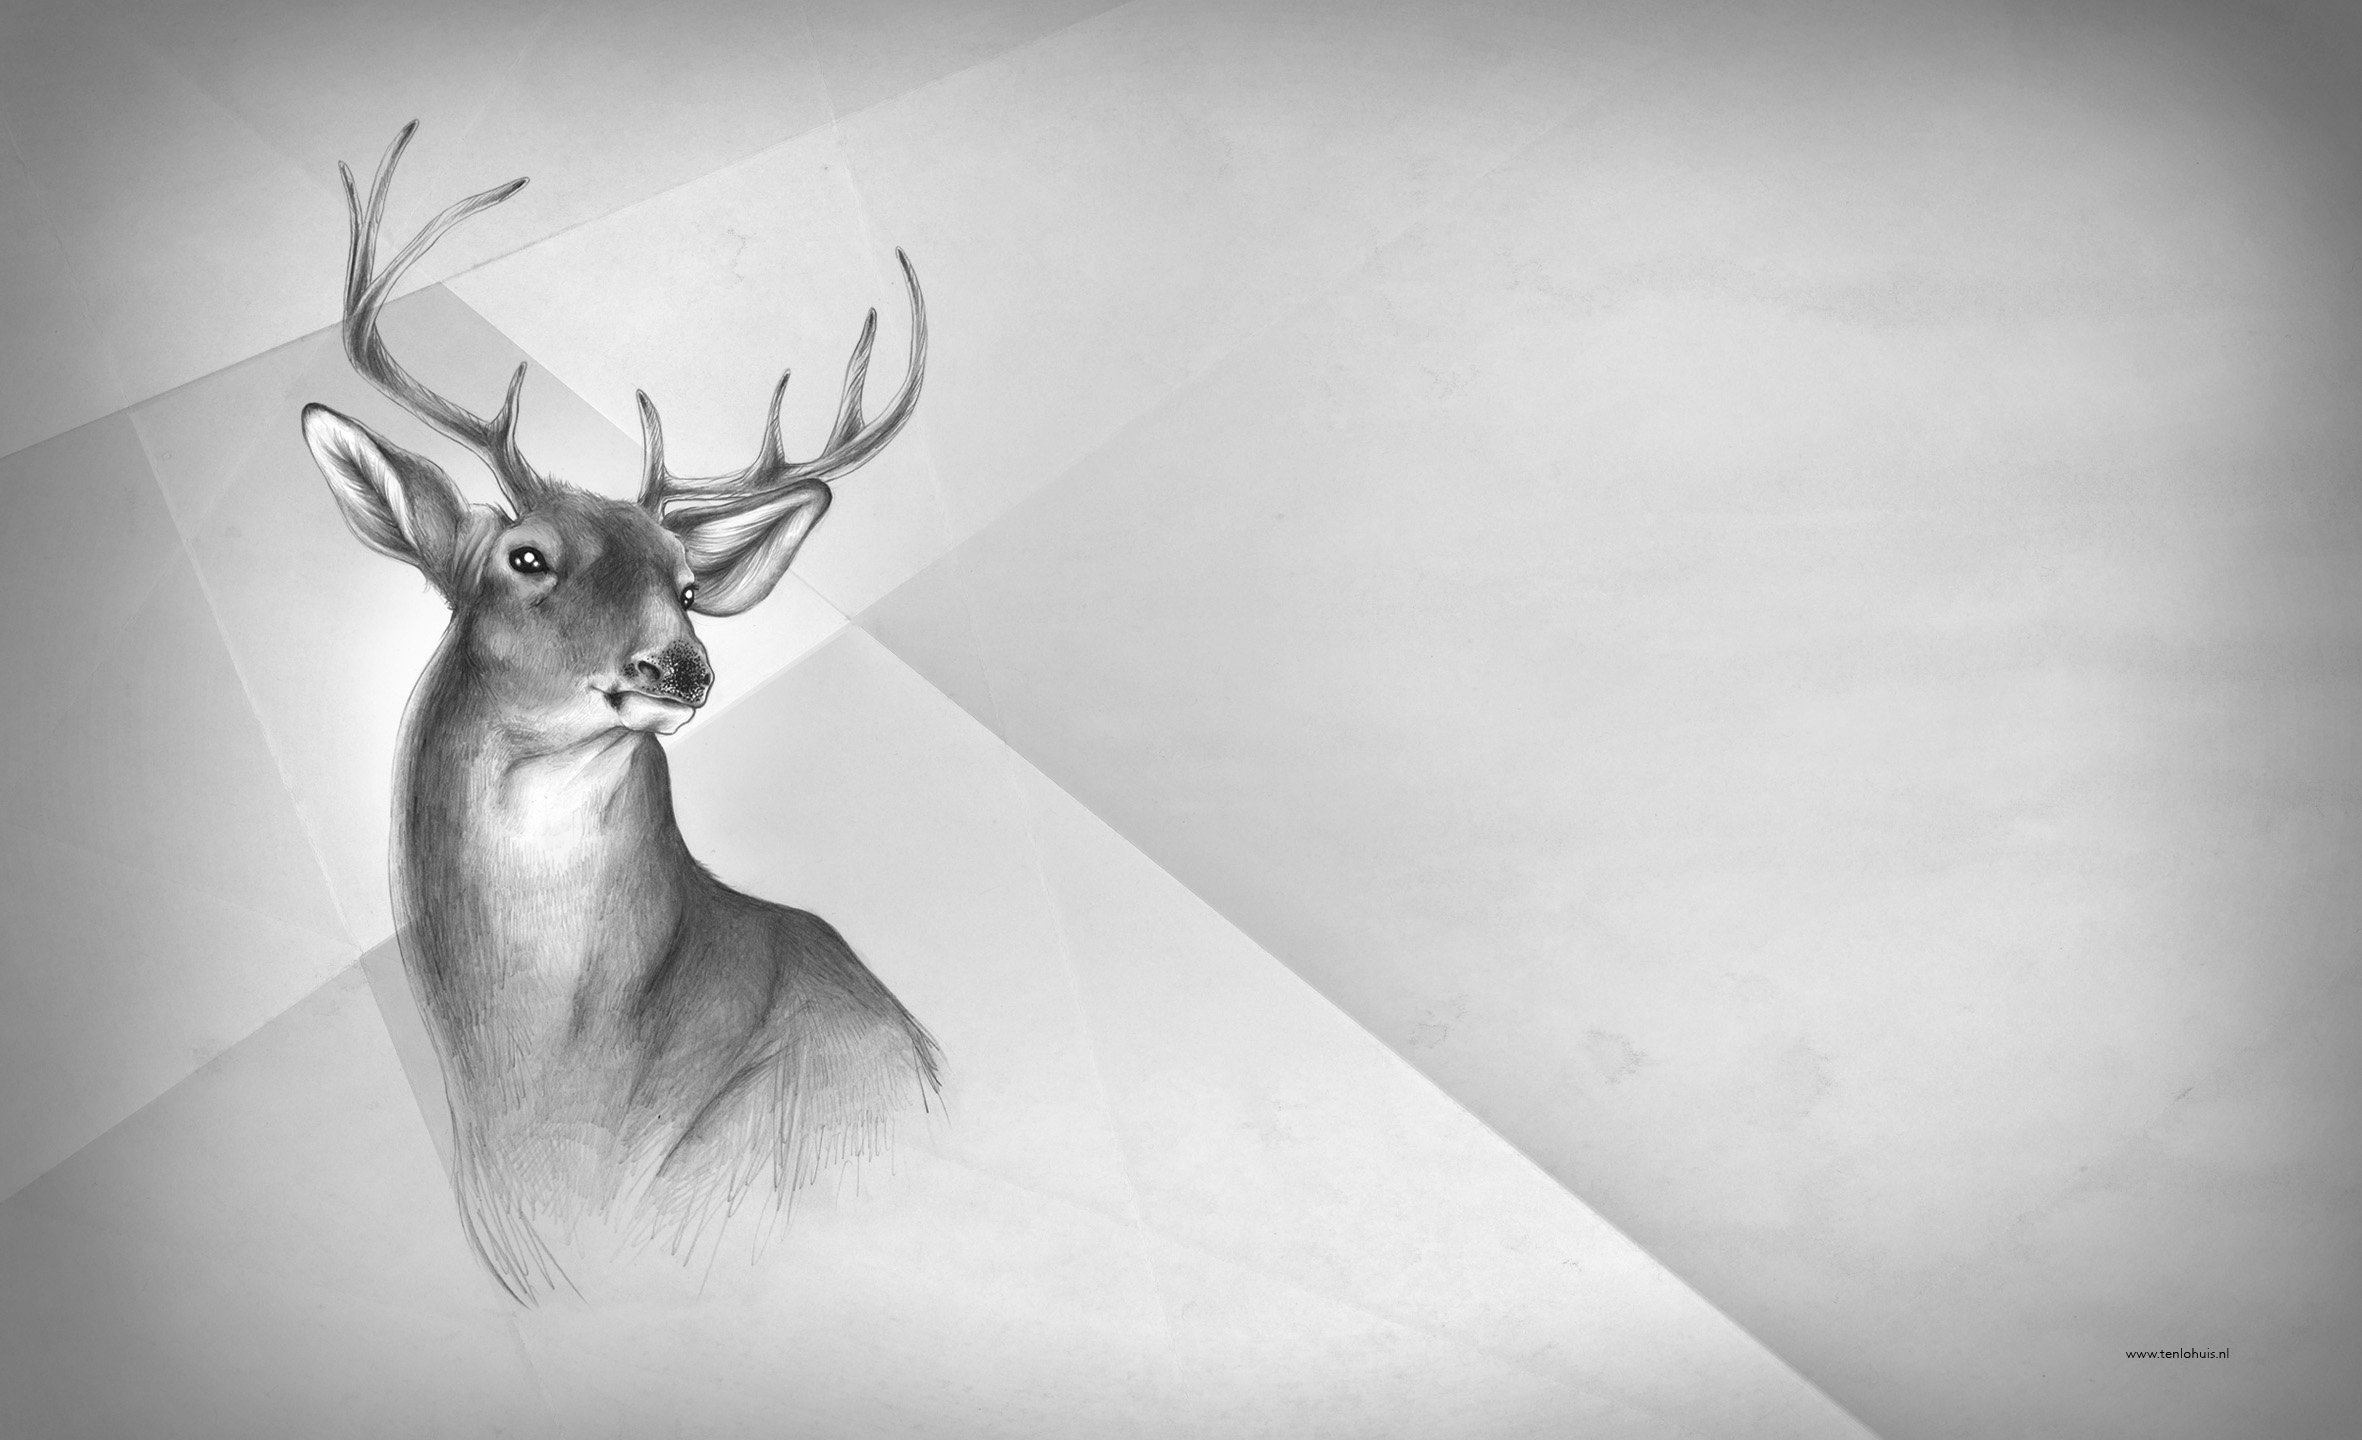 deer black white art painting animal wallpaper | 2362x1440